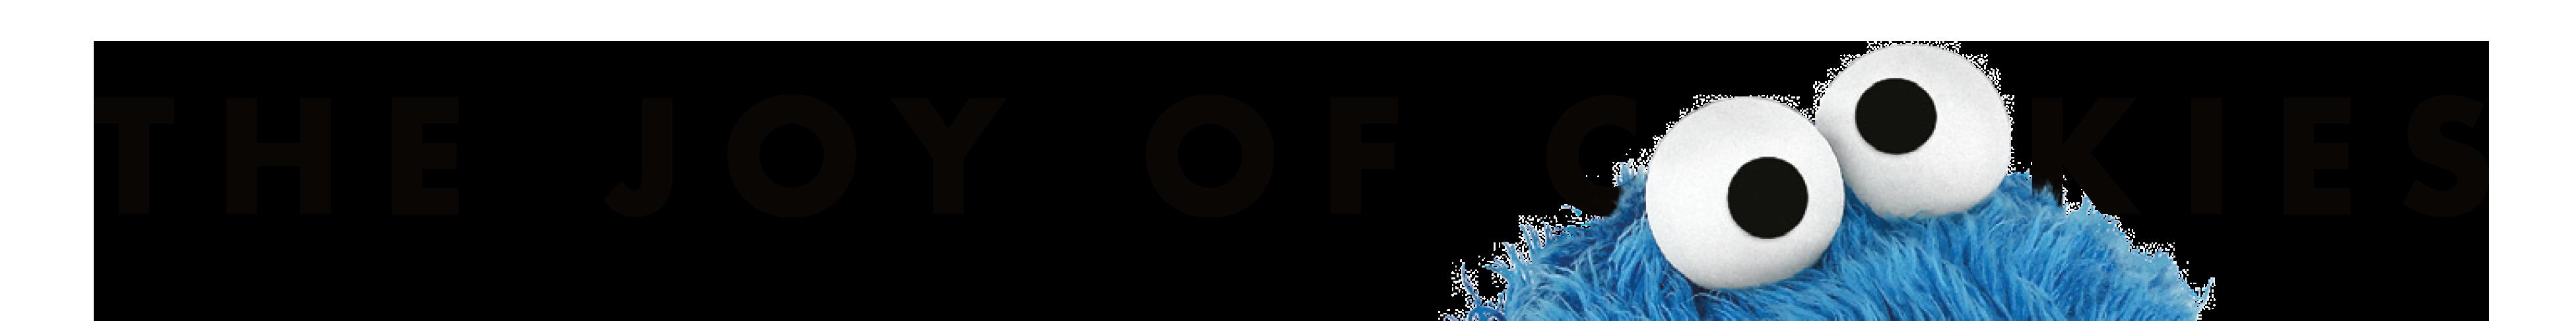 JoC-Banner